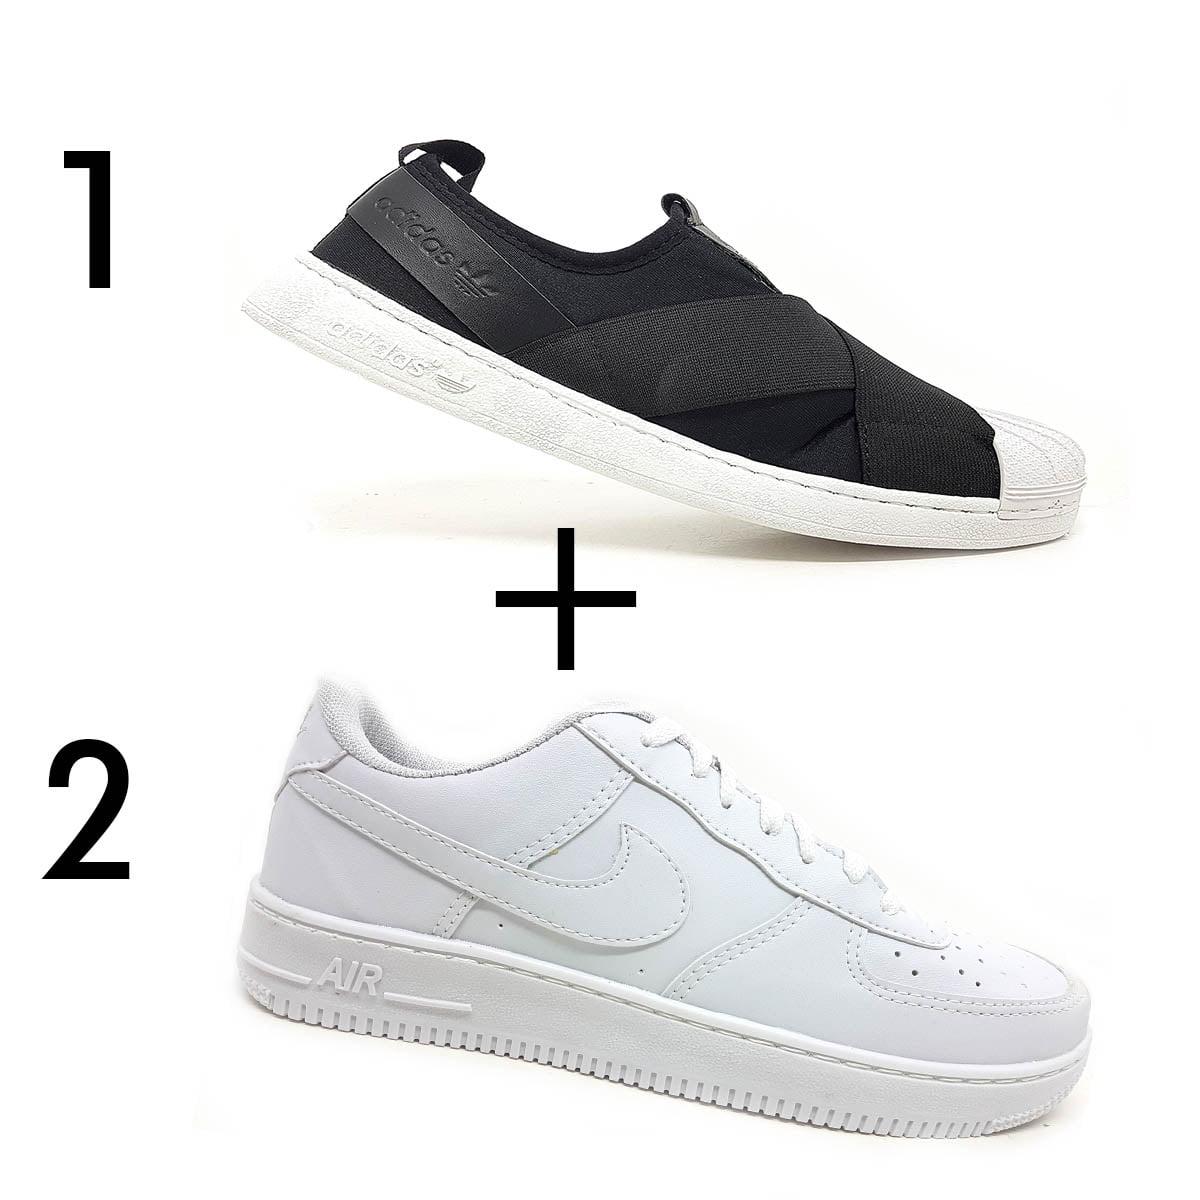 Kit 2 Tênis 1 Adidas Slip On + 1 Nike Air Force 1'07 Branco